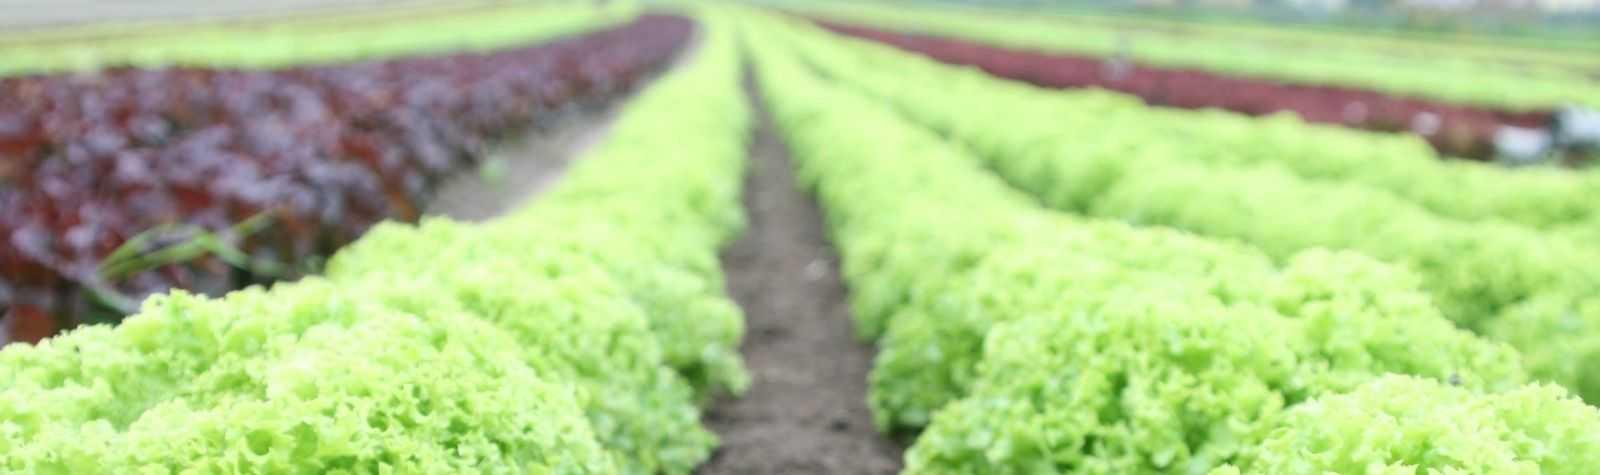 Una de cada cinco verduras exportadas por España son murcianas